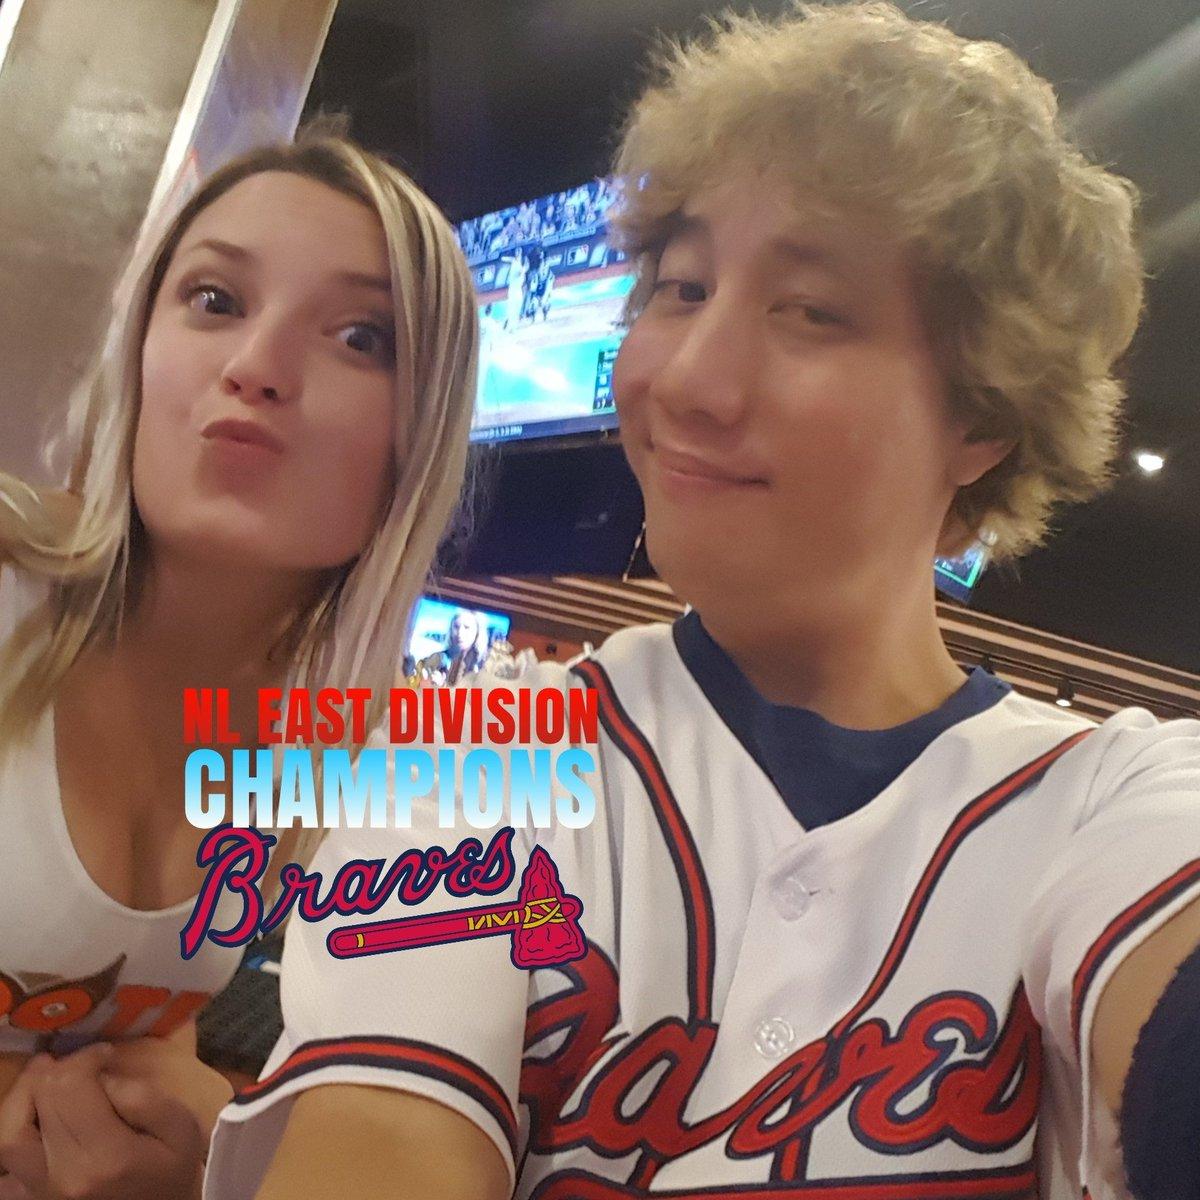 #Bayley #Smackdown #SmackdownLive #ShortyGable #RobertFoster #ElCamino #ShaneXJeffree #chixtape5 #LoveAfterLockup #Mikolas #ABGT350 #Virginia #WomensTitle #Dynasty #SDLive #BreakingBadAFilm #JoseMartinez #AtlantaBraves #NLDS #NLDSgame5 #ChopOn #Braves